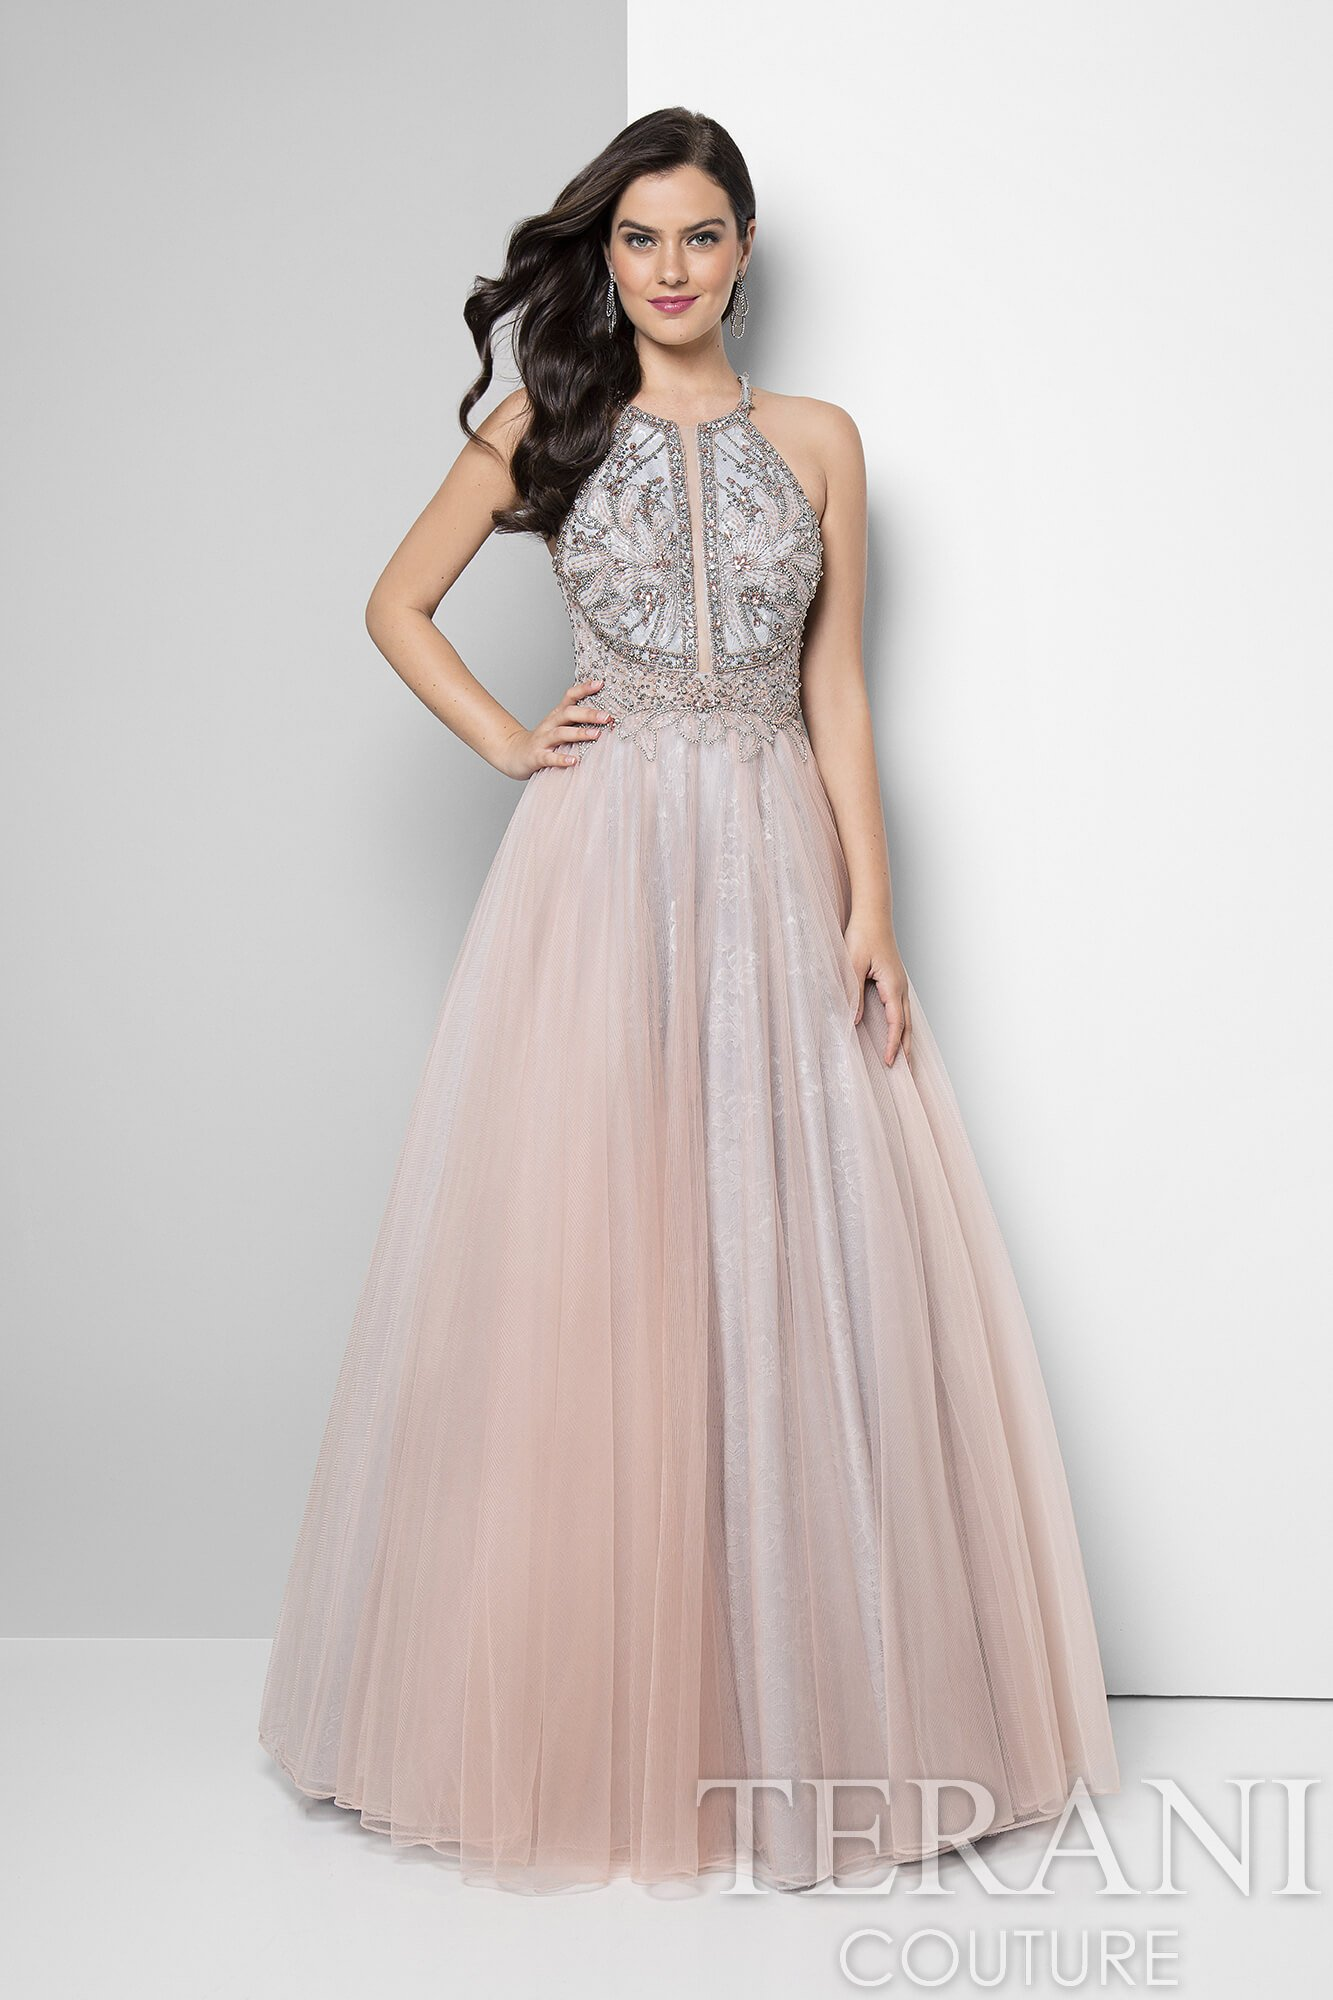 Best formal wedding dresses 2017 2018 online usa uk canada ombrellifo Gallery